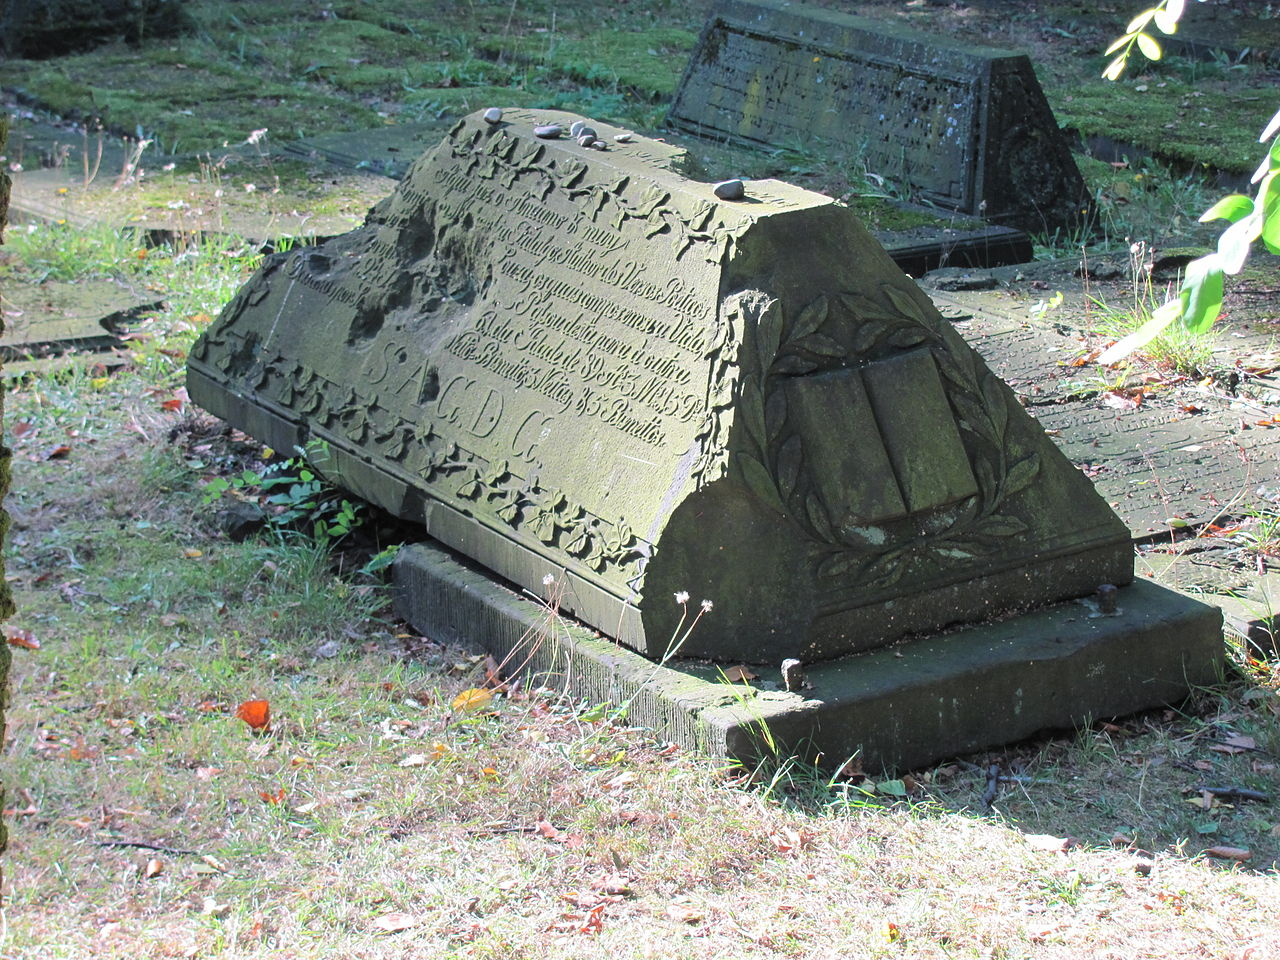 Jüdischer Friedhof Altona Sephardischer Teil-03.nnw.jpg